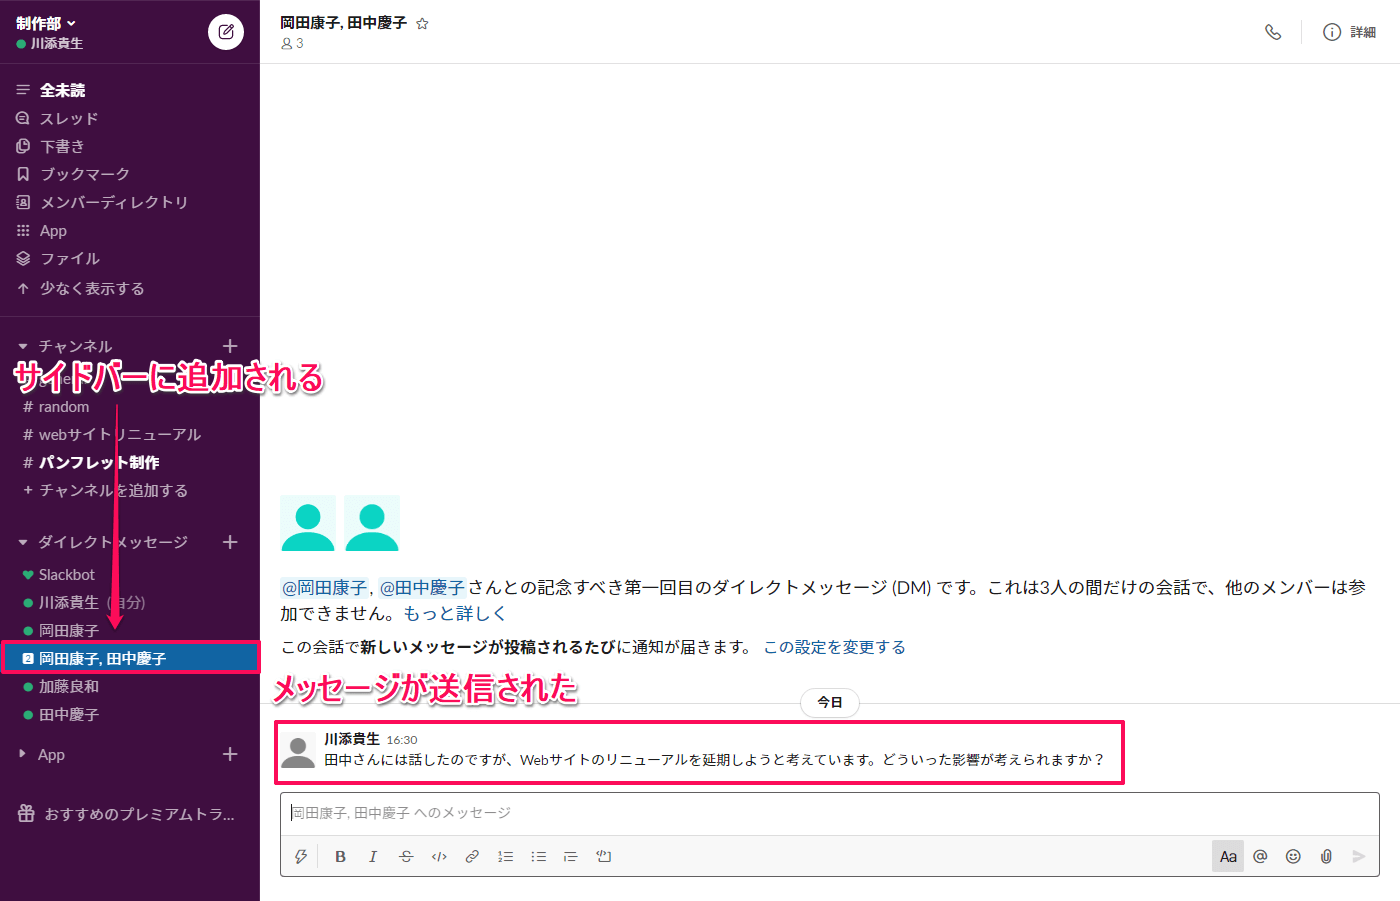 【Slack】ダイレクトメッセージを送る方法。特定のメンバーと個別に会話できる